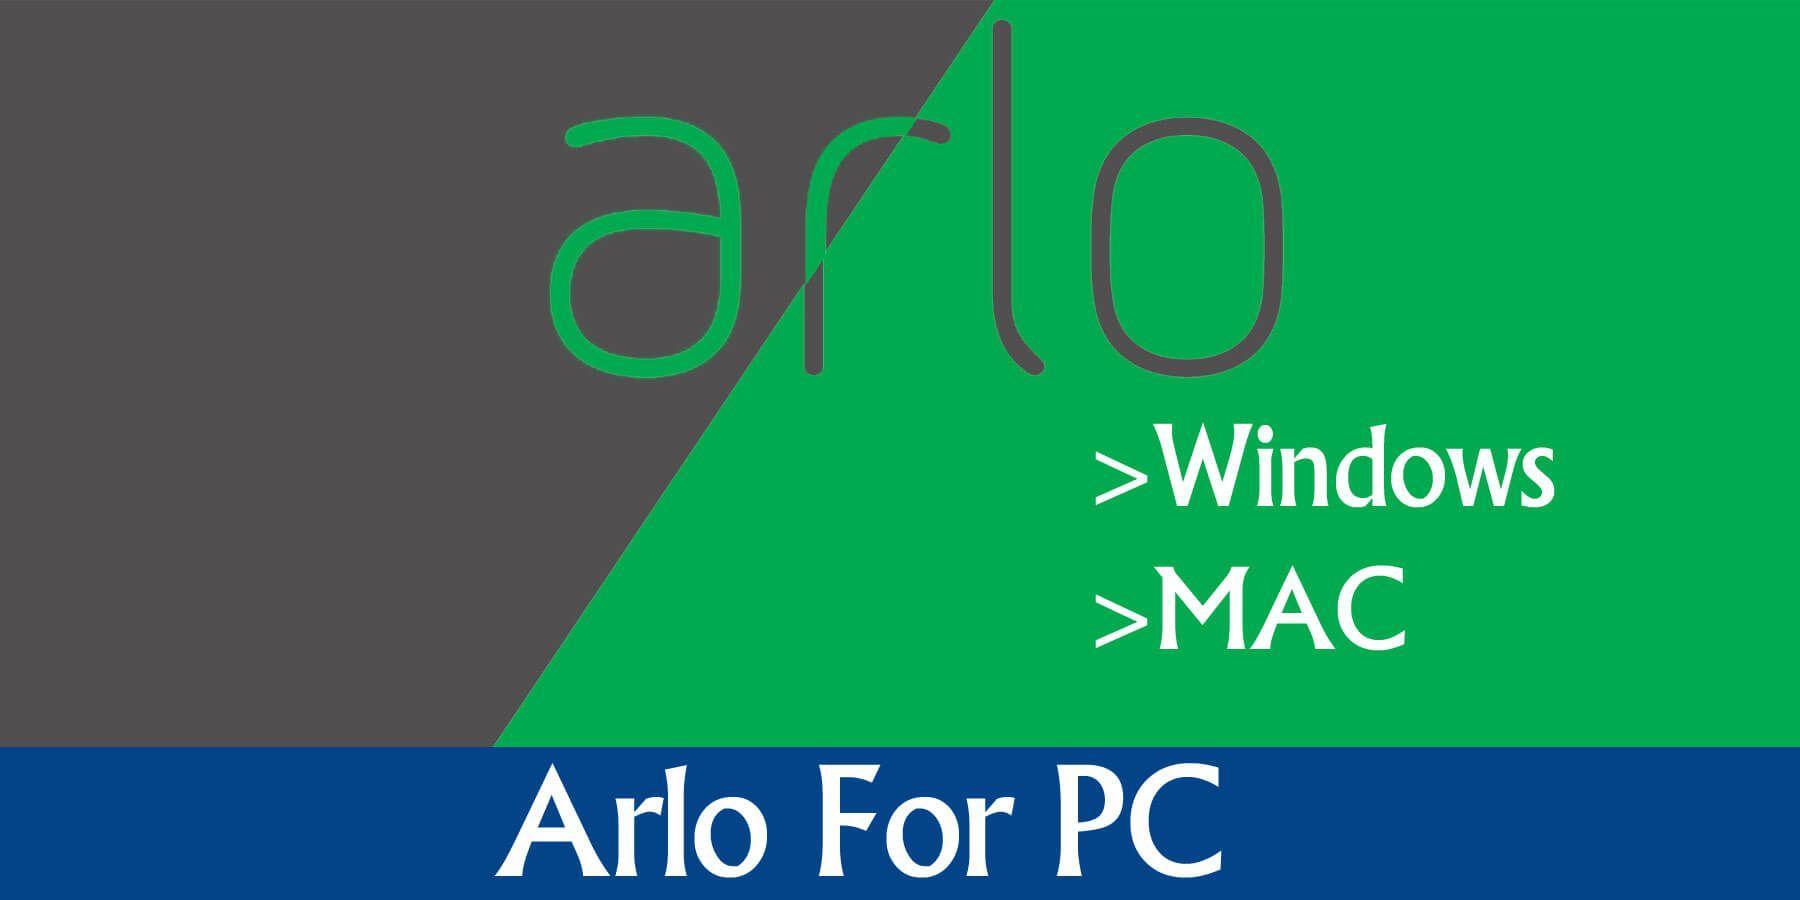 Arlo app for pc download for windows7810 mac wifi